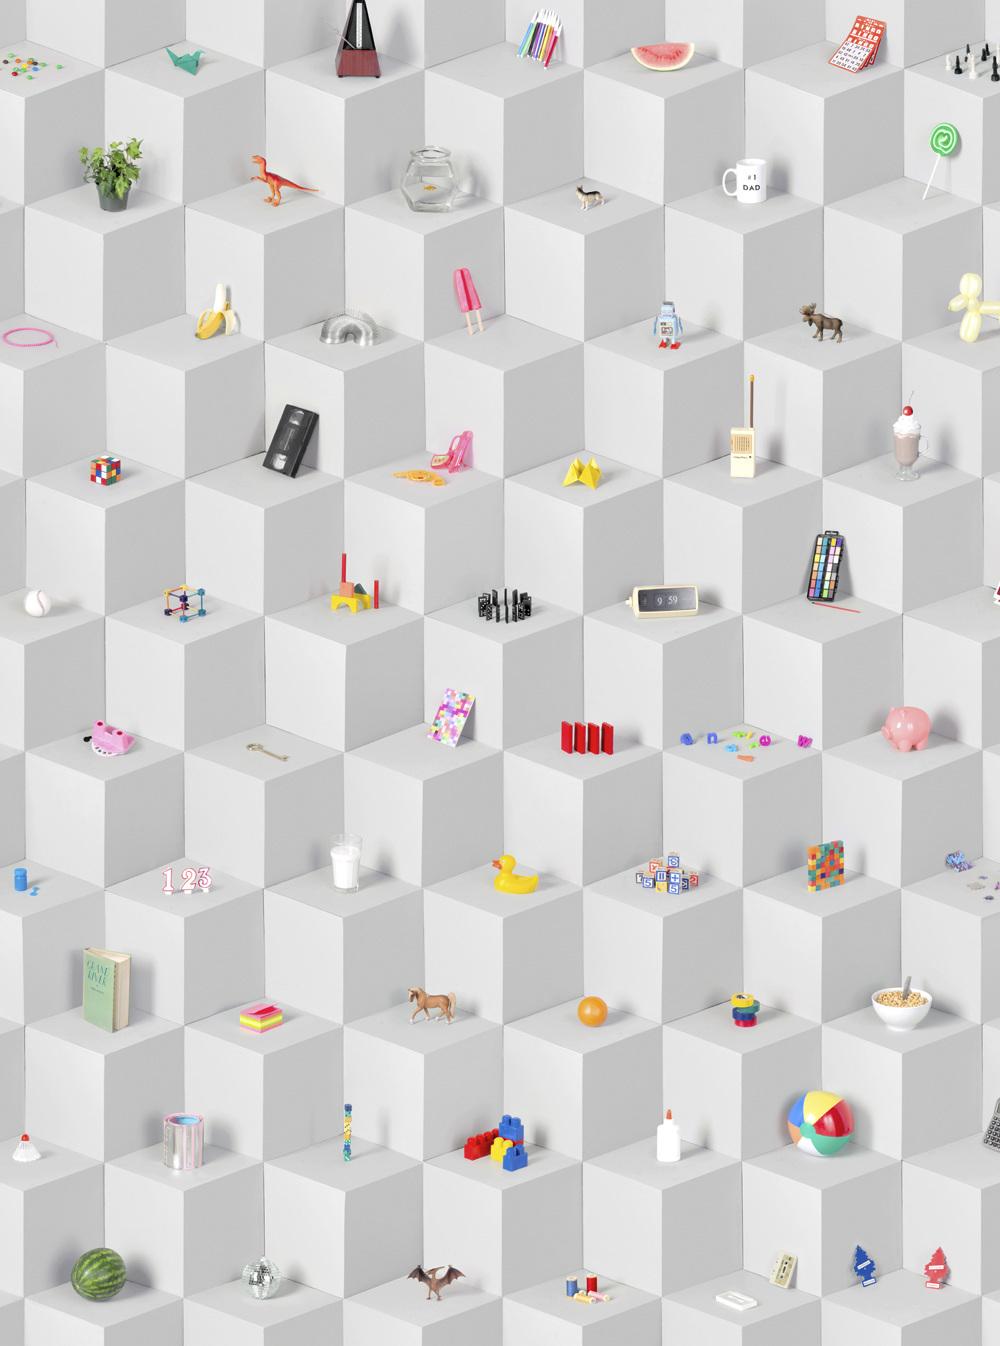 cubes_1000_1000.jpg